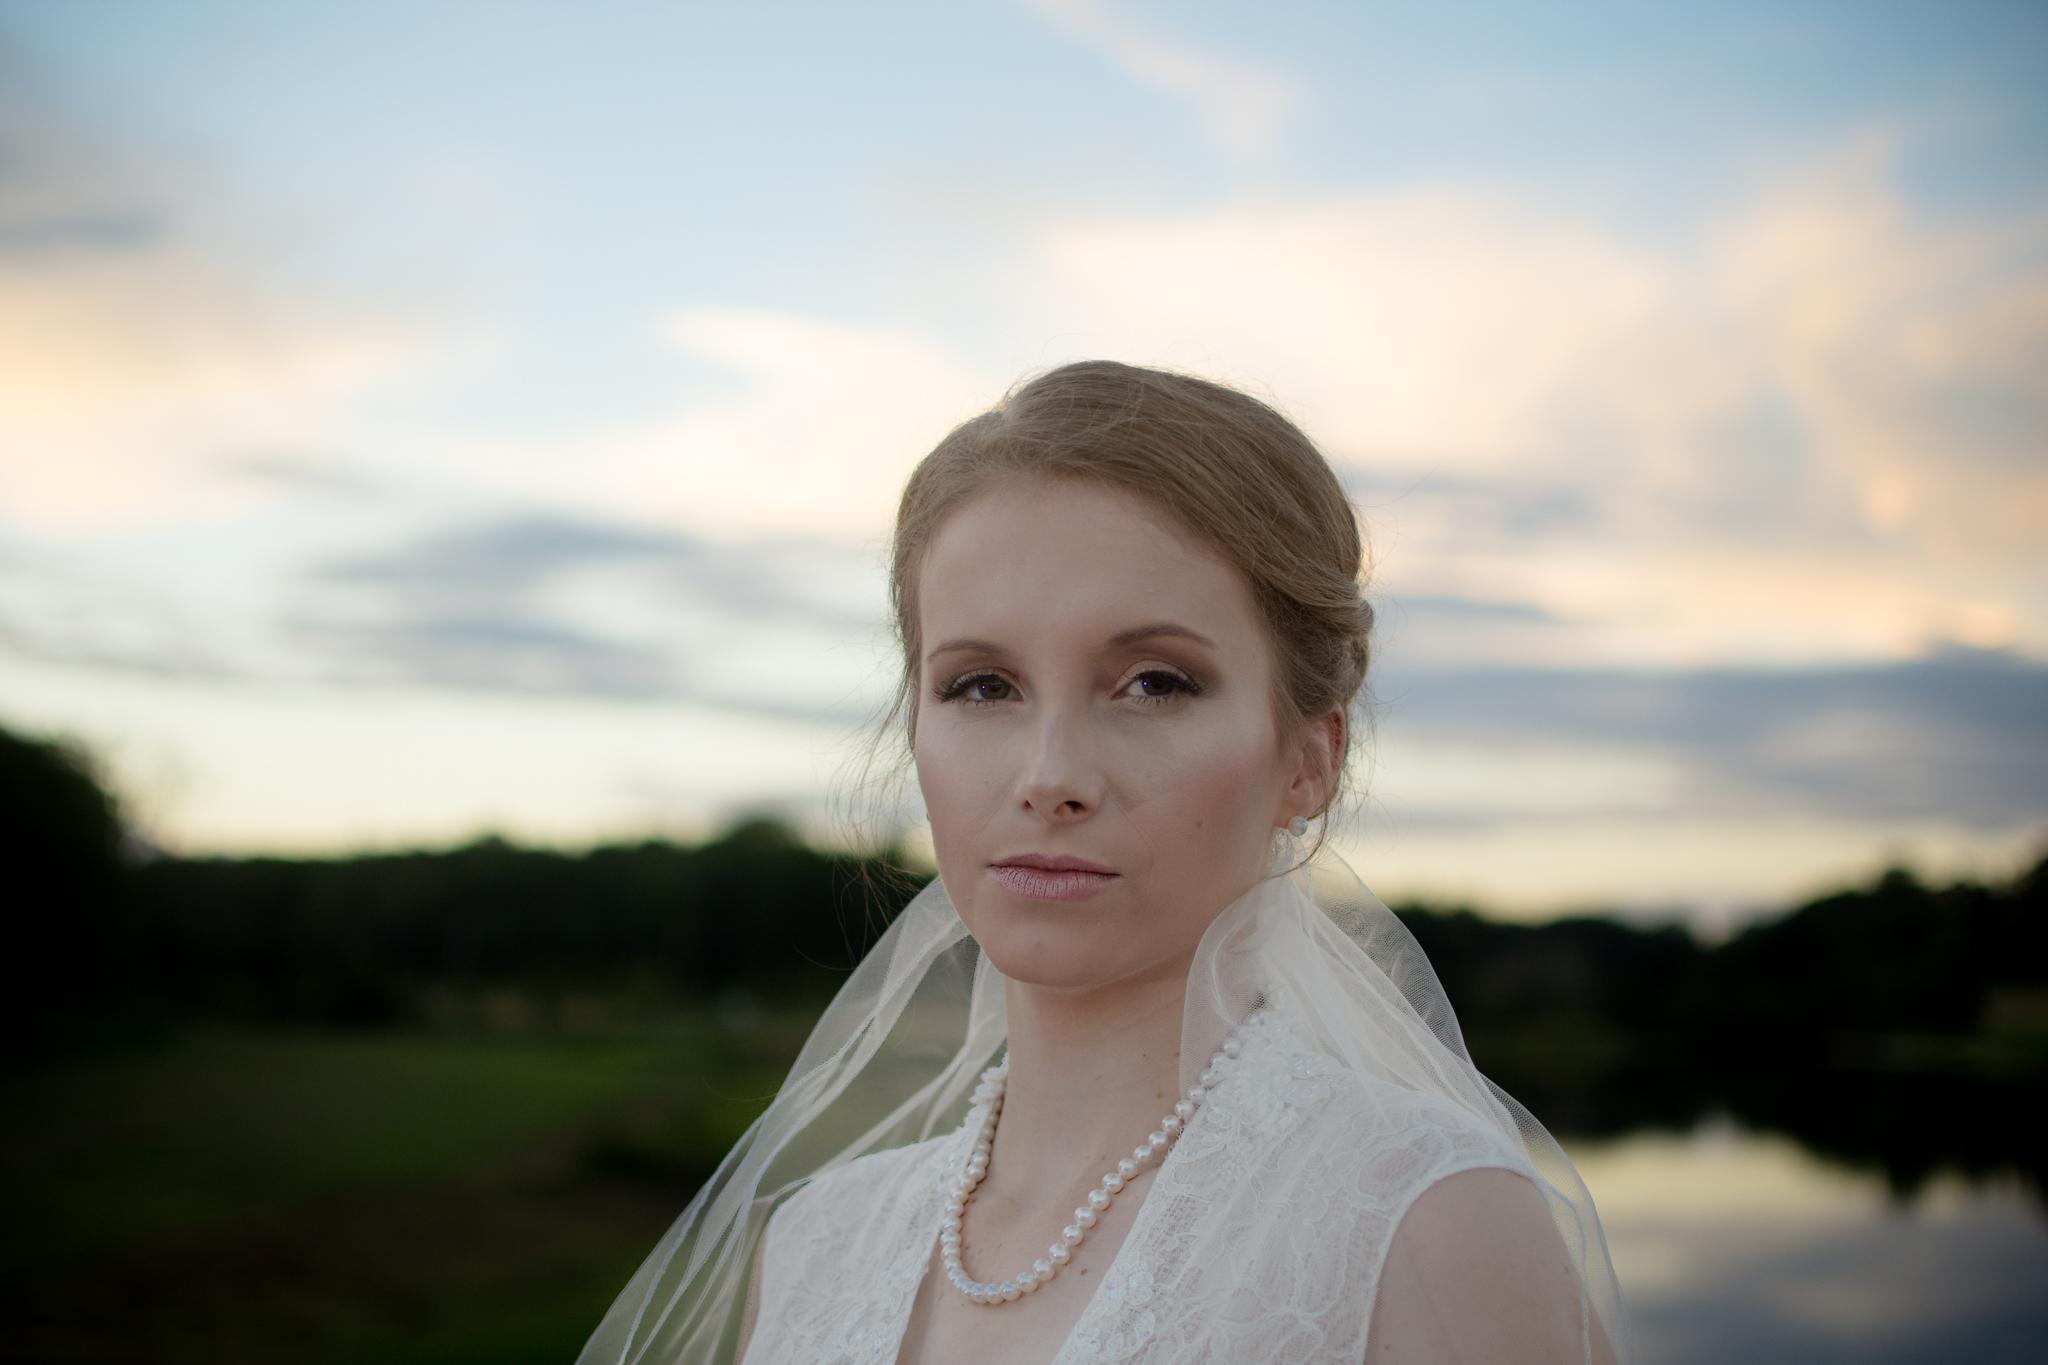 bridalportraits (44 of 49).JPG